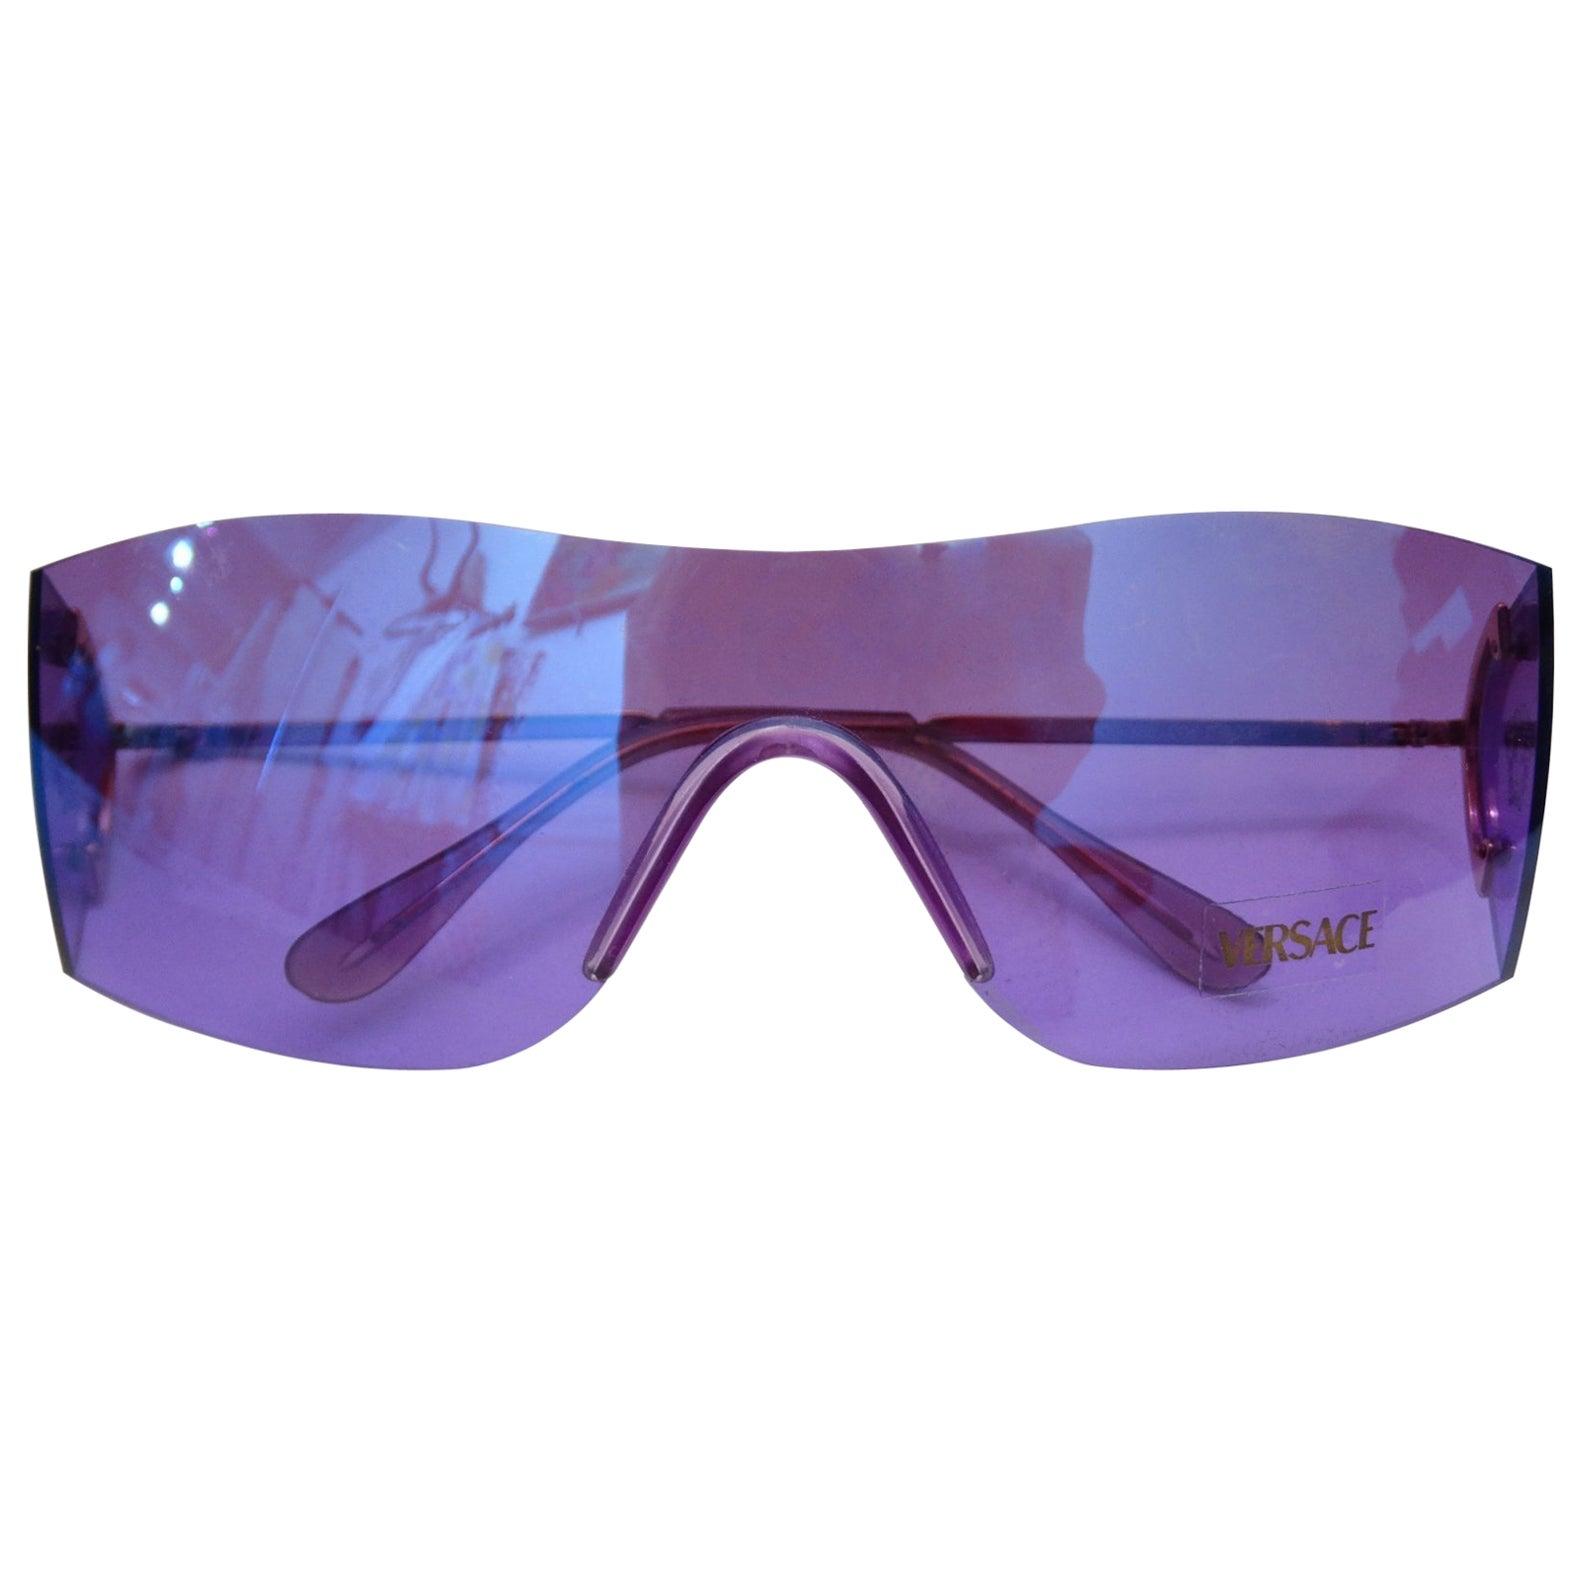 44a0a958a8d 1990s Versace Purple Iridescent Shield Sunglasses at 1stdibs